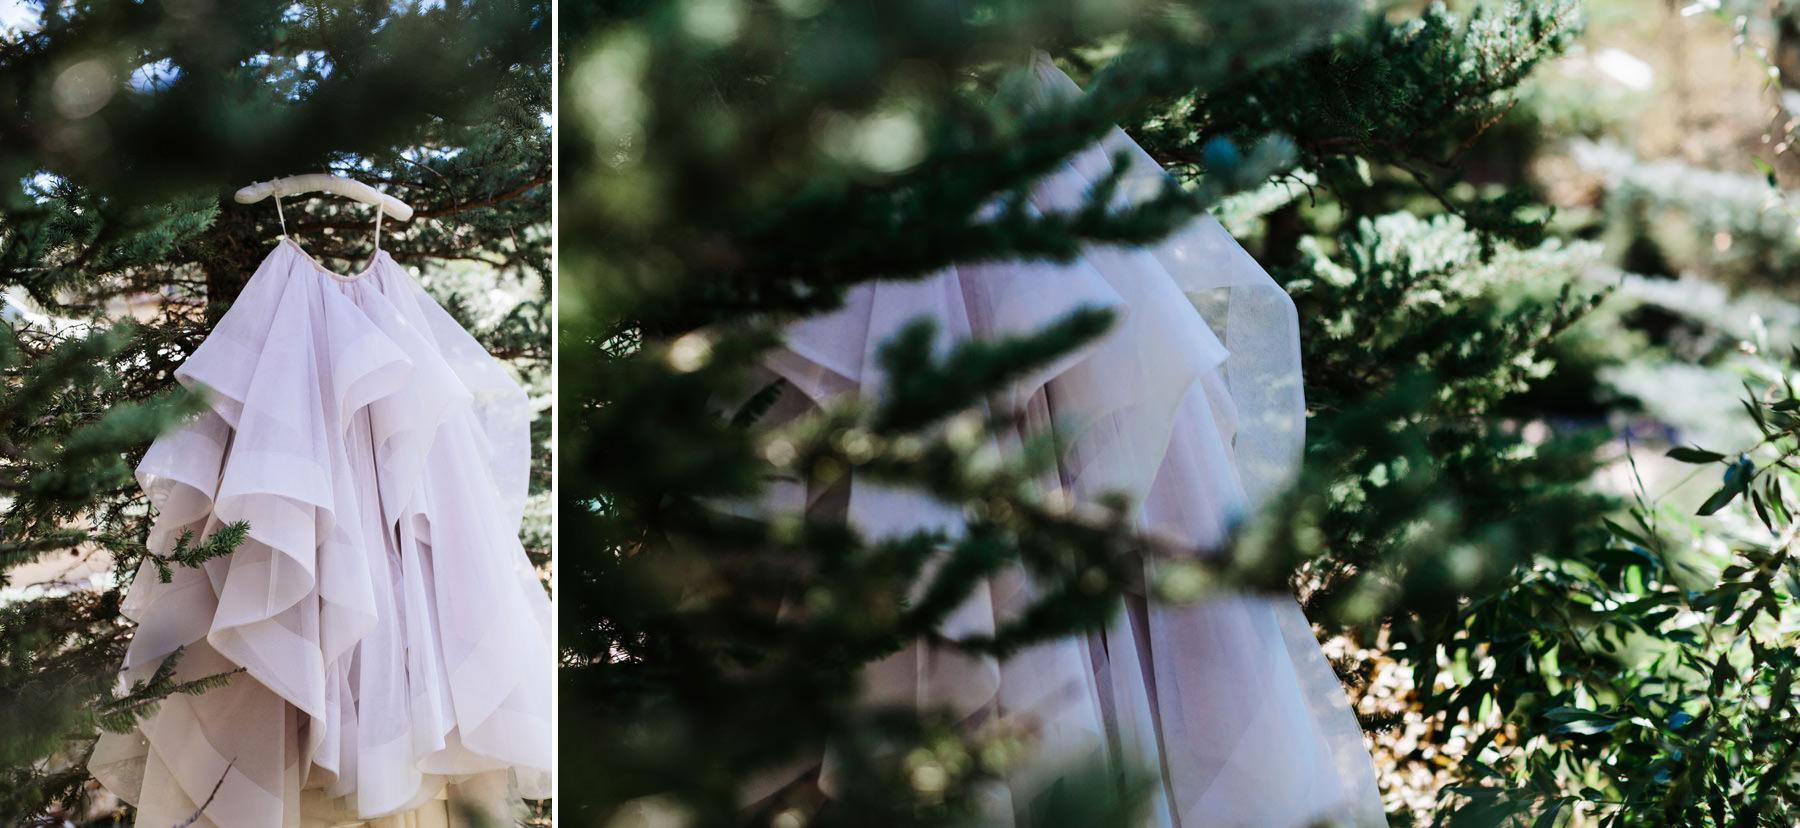 Vail Colorado Wedding Deck_ Kindling Wedding Photography03.JPG